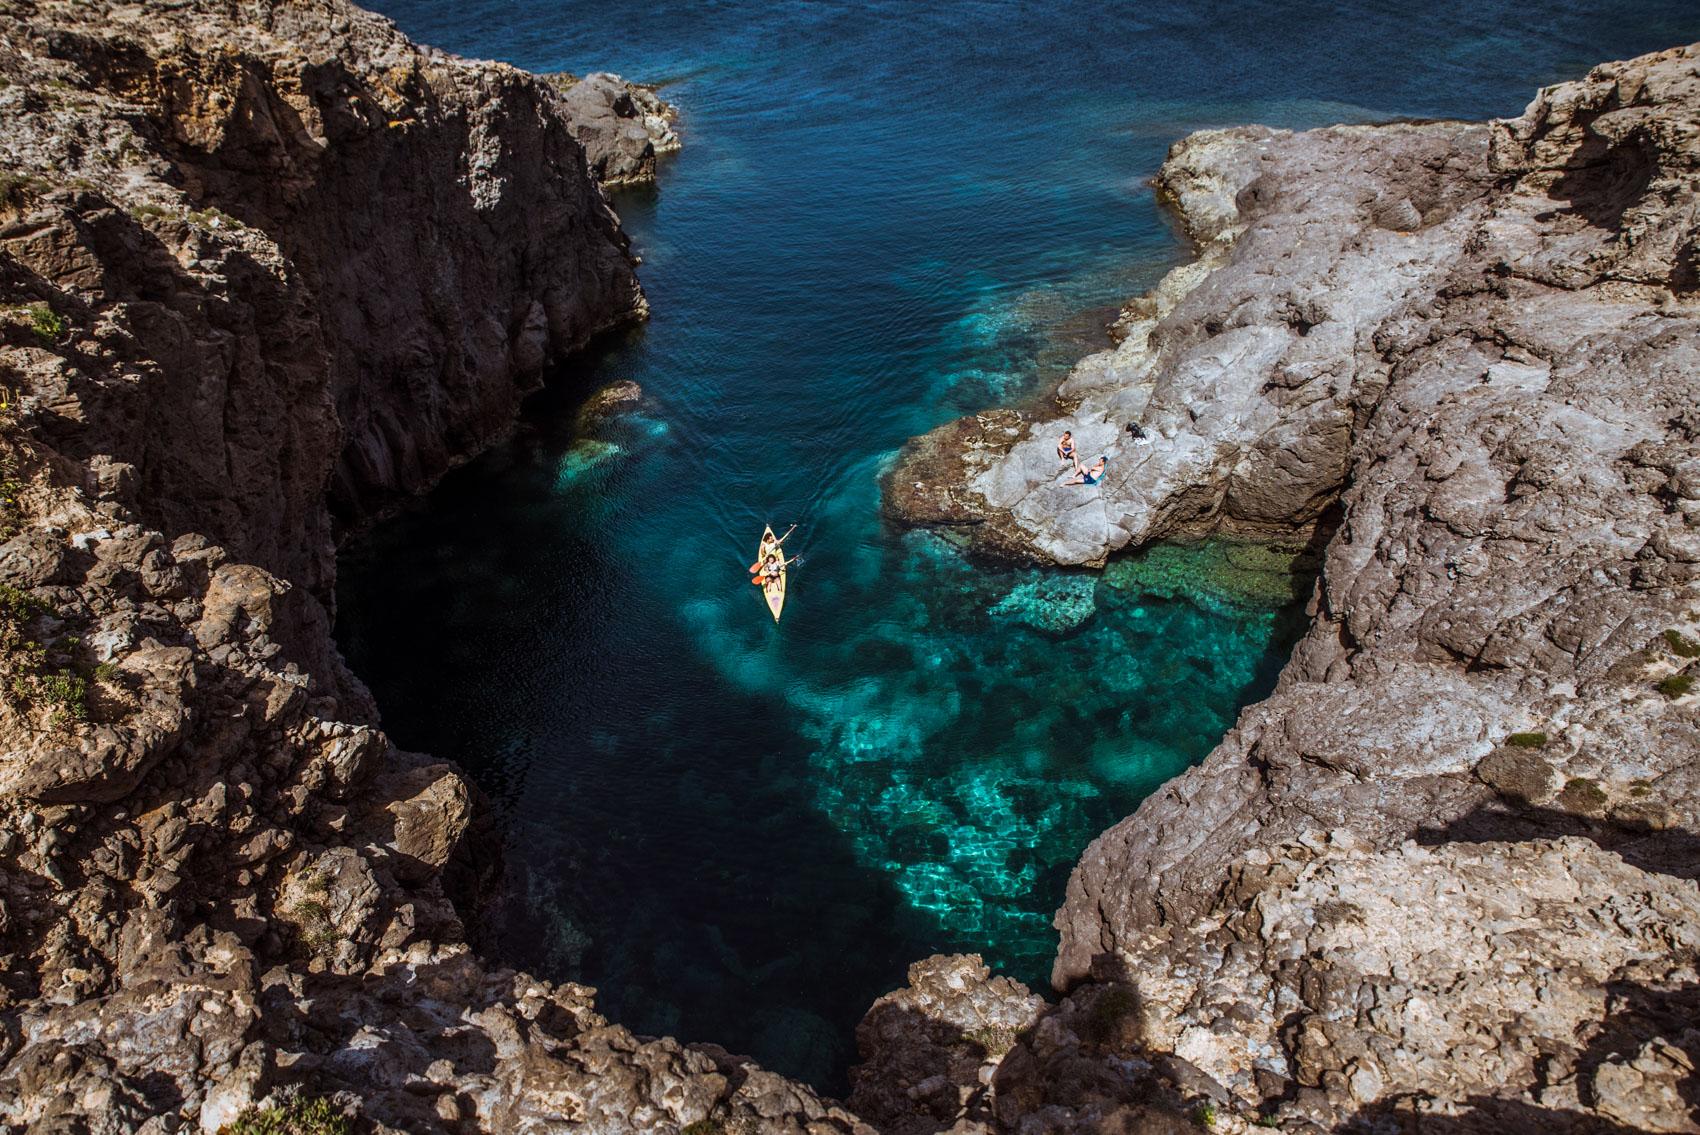 Cala Grotta